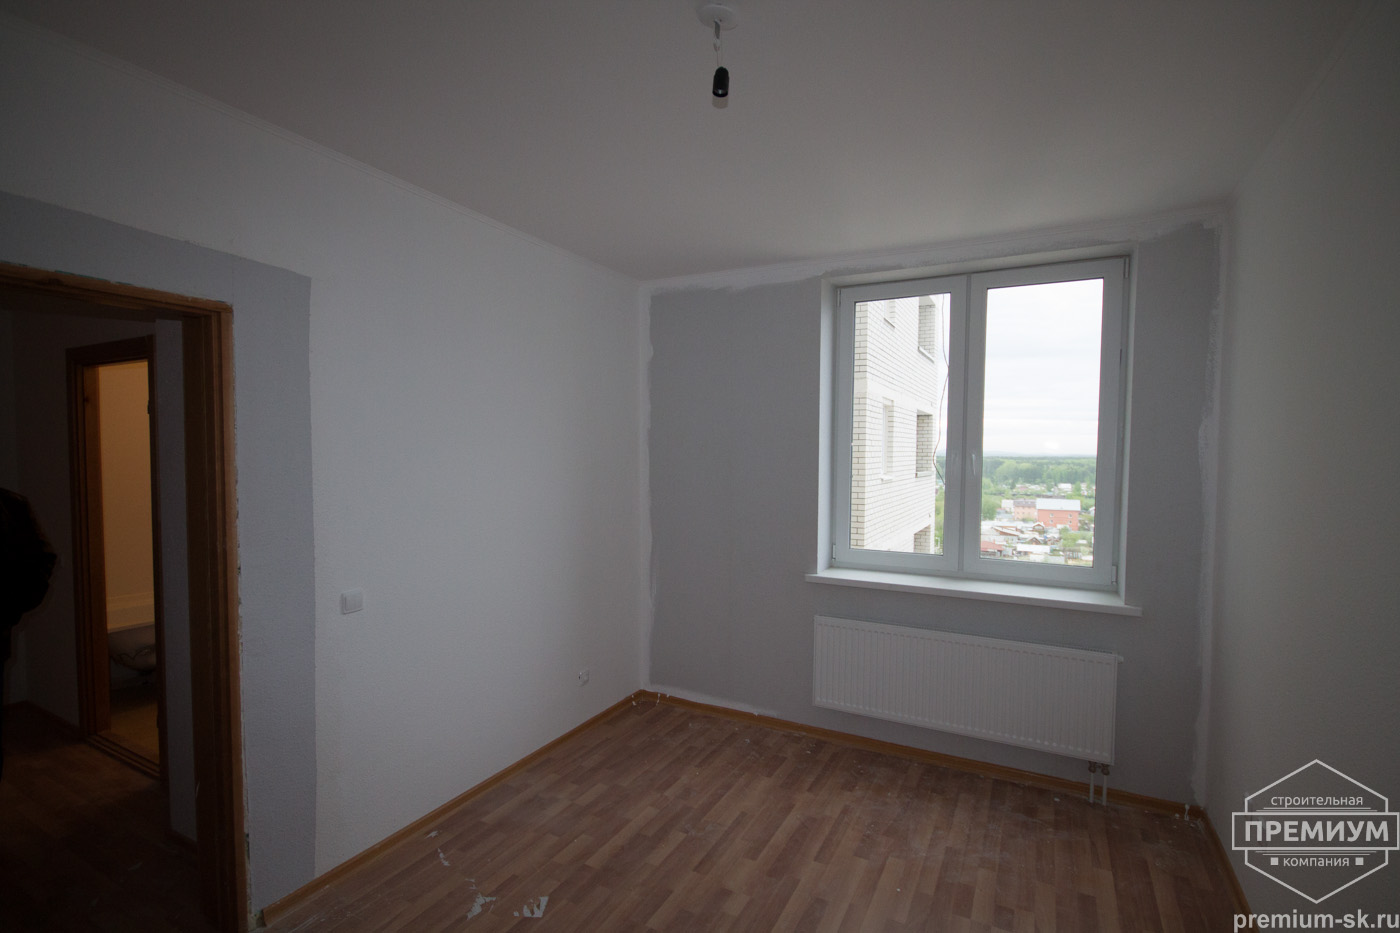 Ремонт электрики в квартире цена екатеринбург